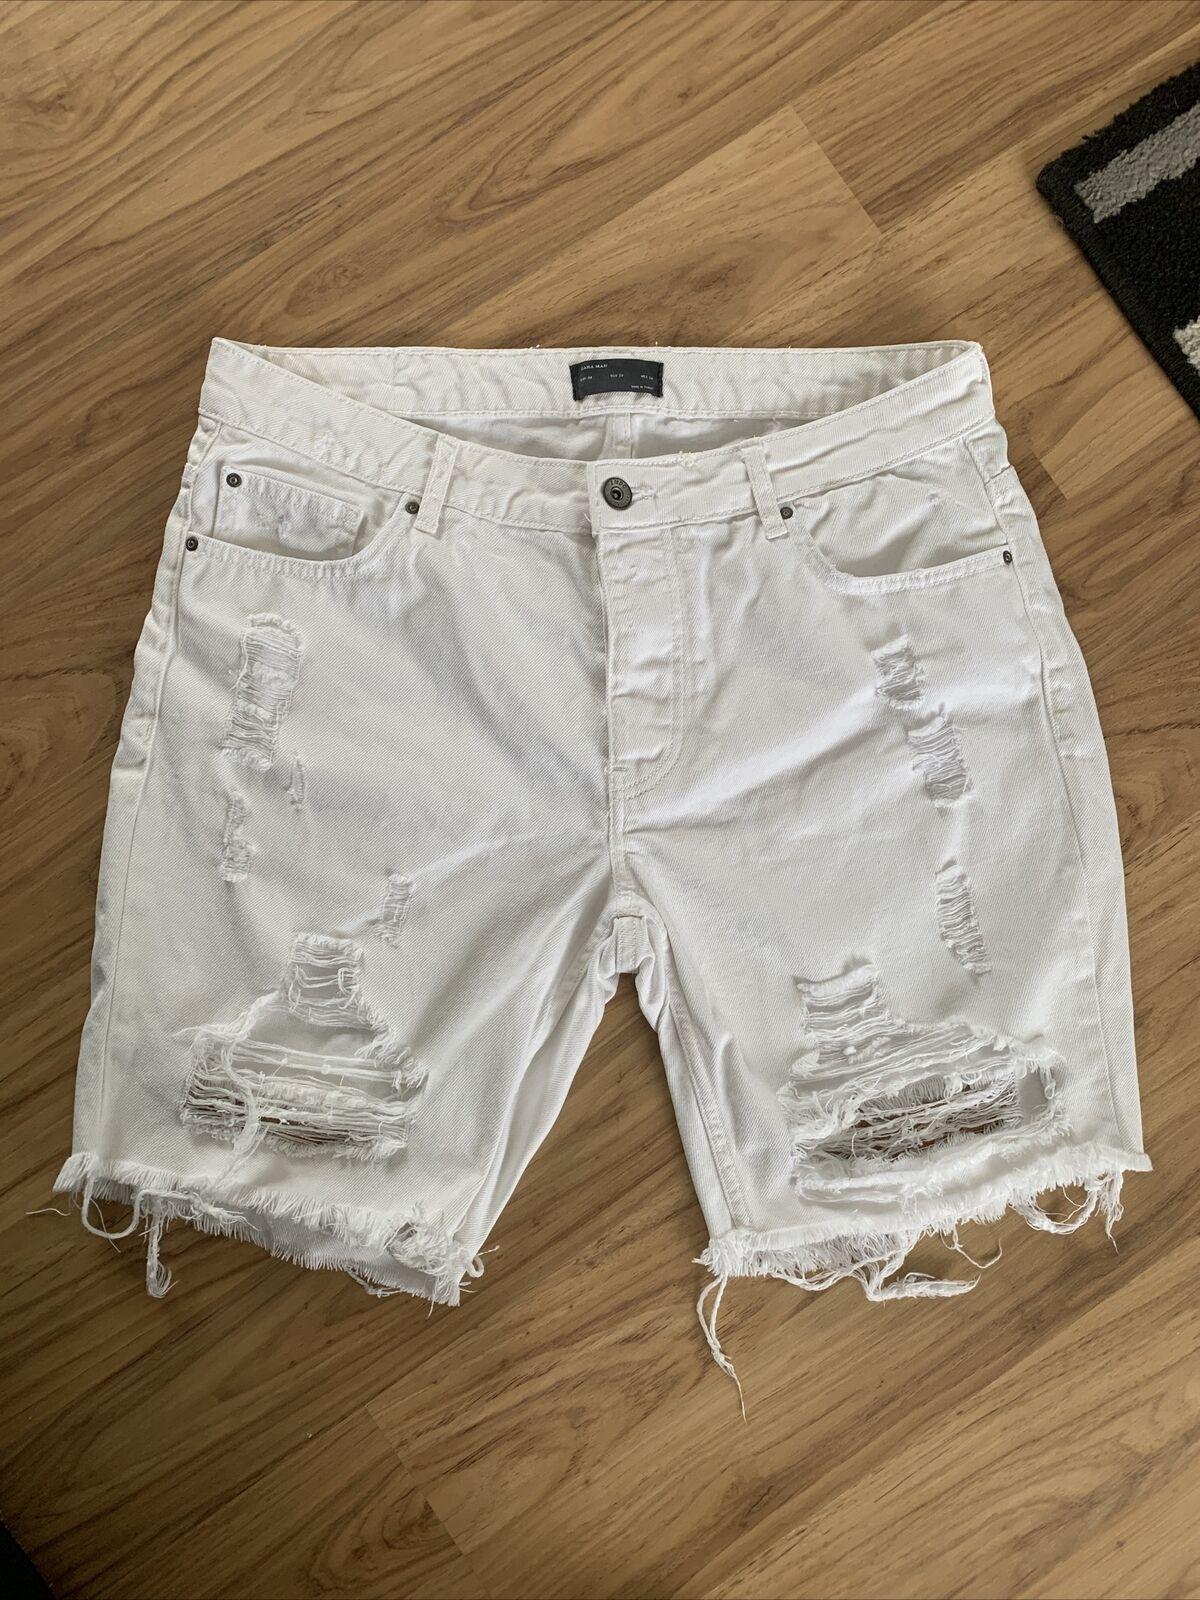 Para Hombre Zara Man Blanco Pantalones cortos de mezclilla Rasgada Talla 34